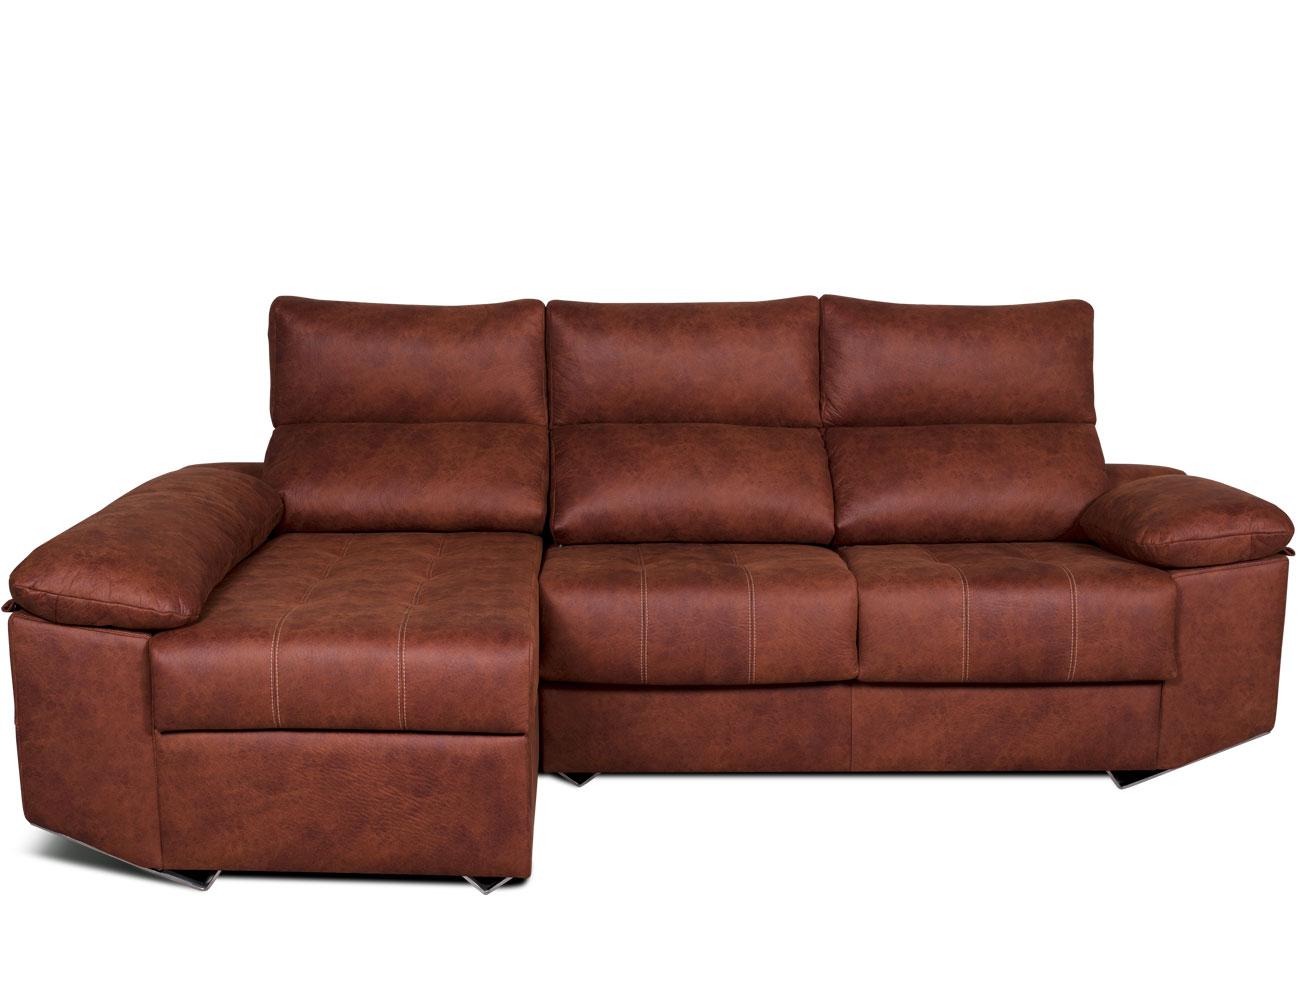 Sofa chaiselongue moderno patas forma tejido anti manchas 212